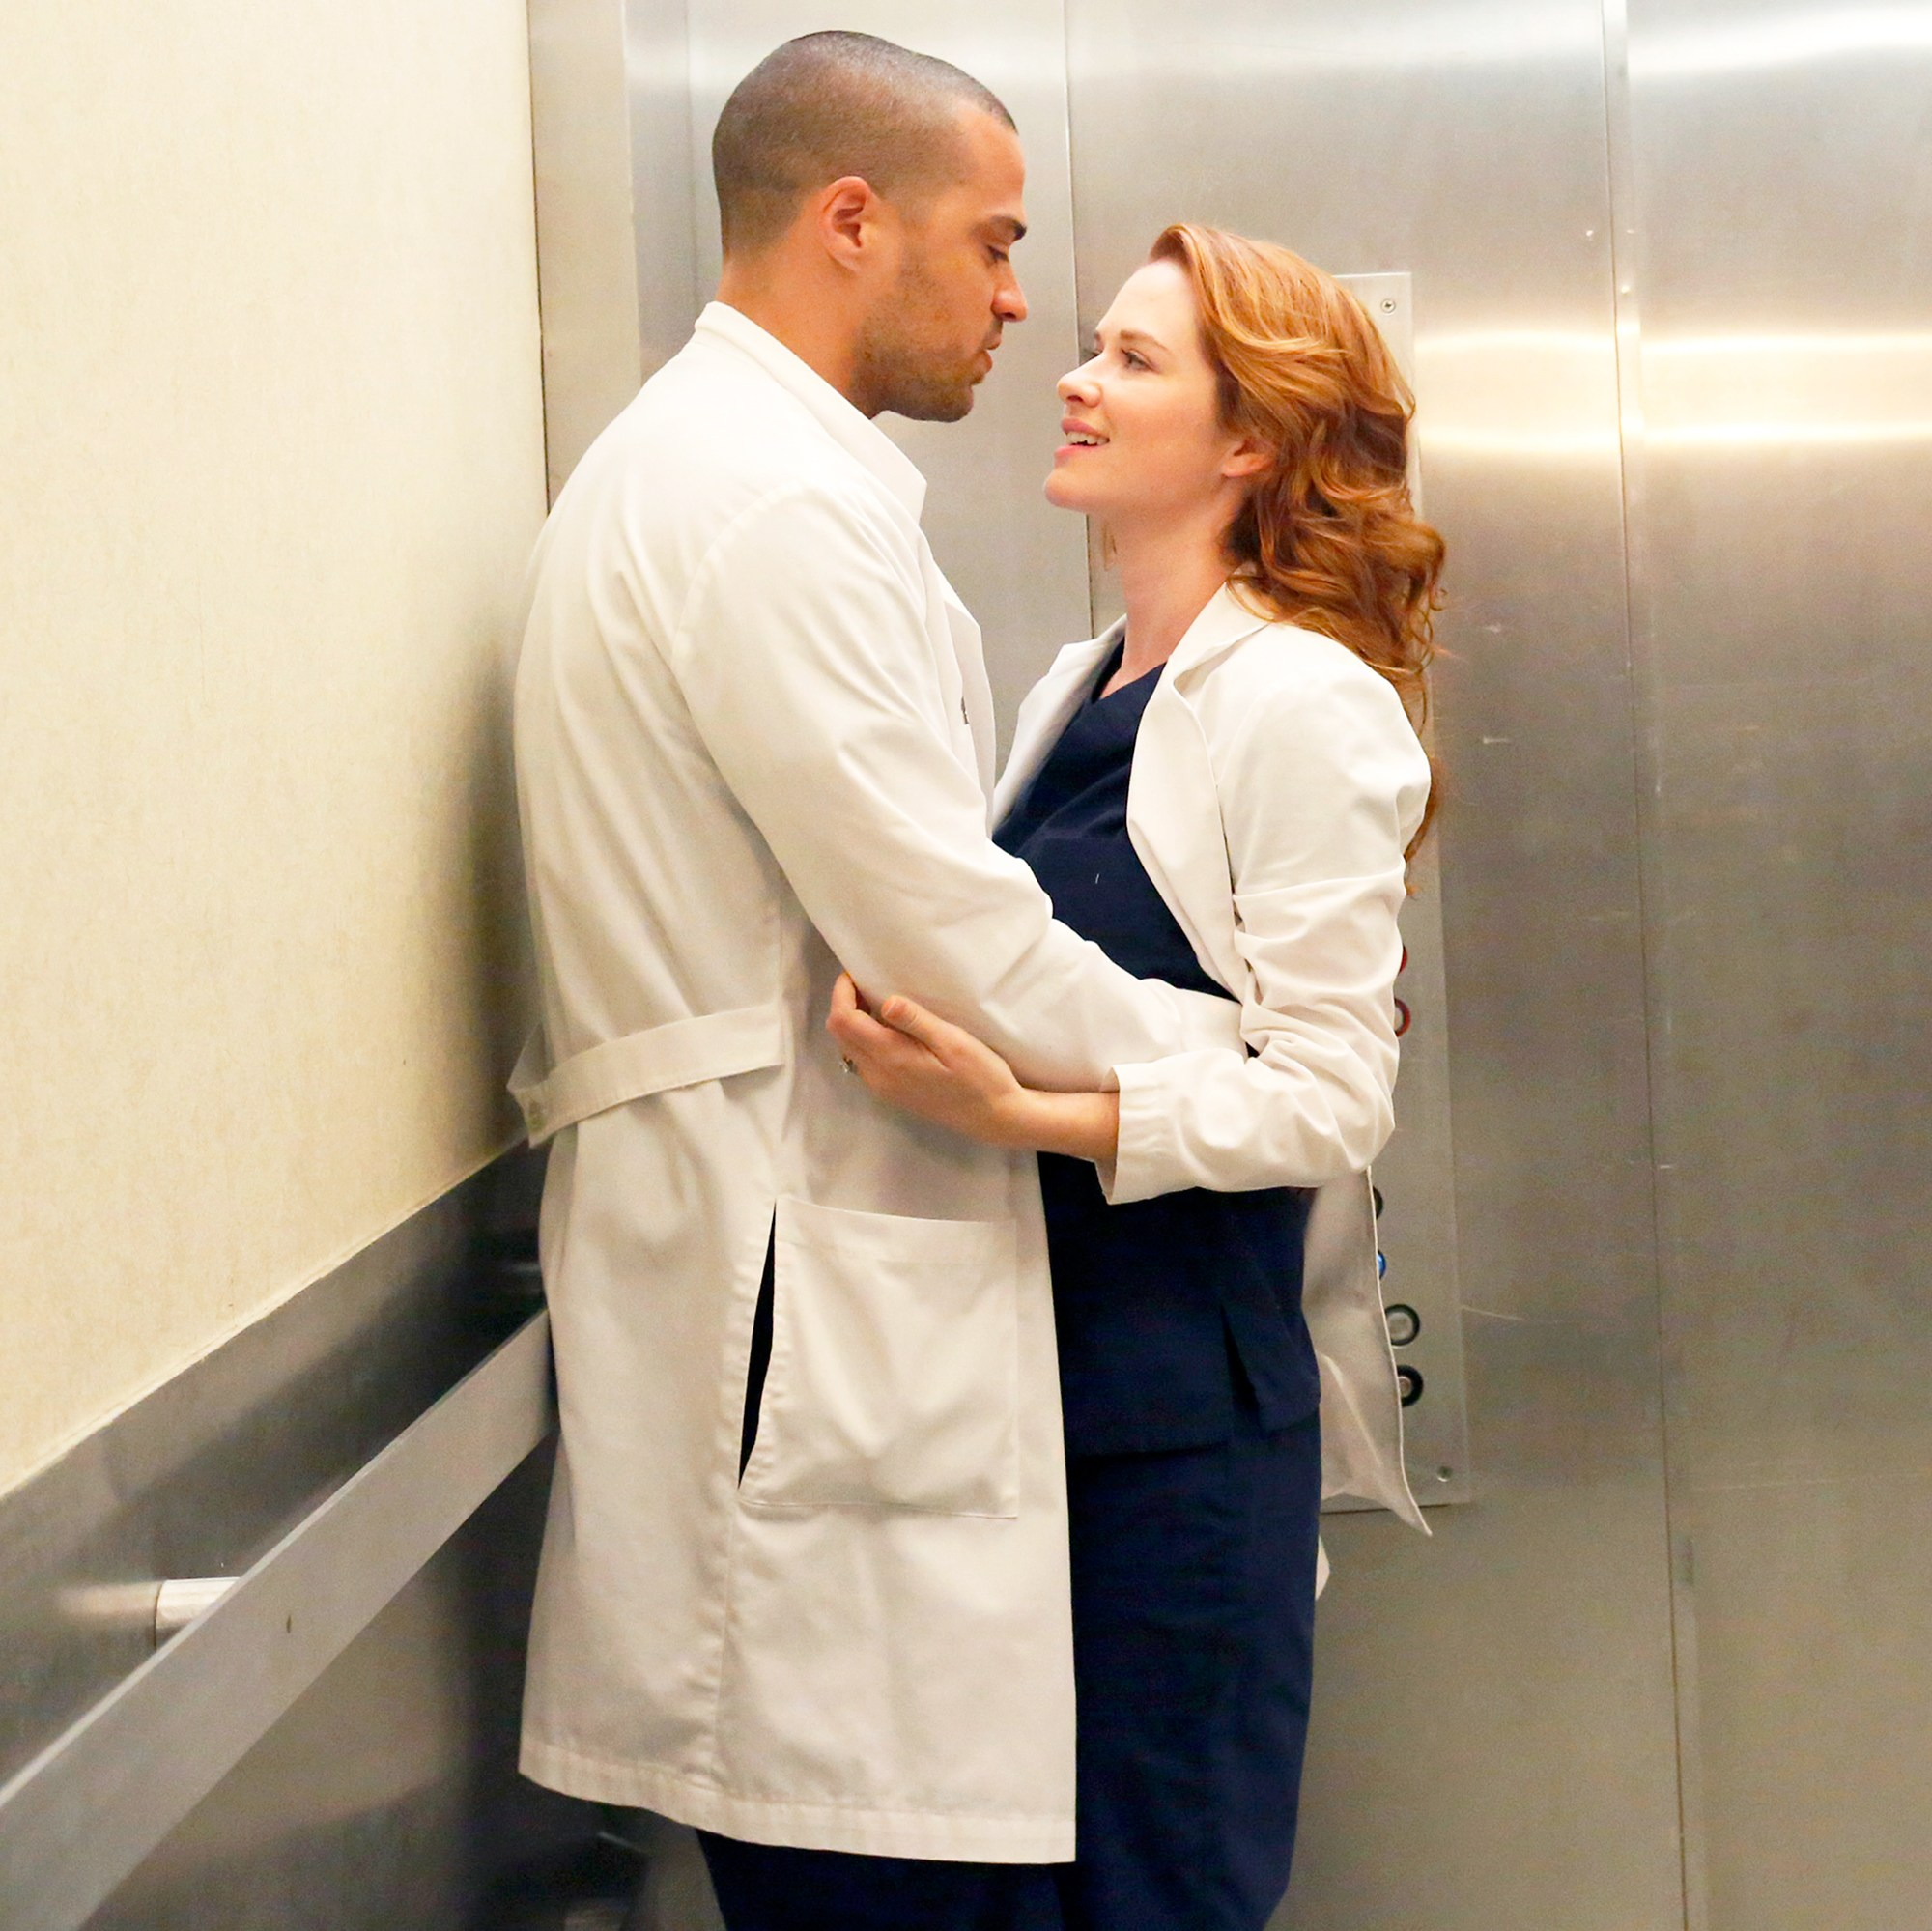 Jesse Williams and Sarah Drew on 'Grey's Anatomy'